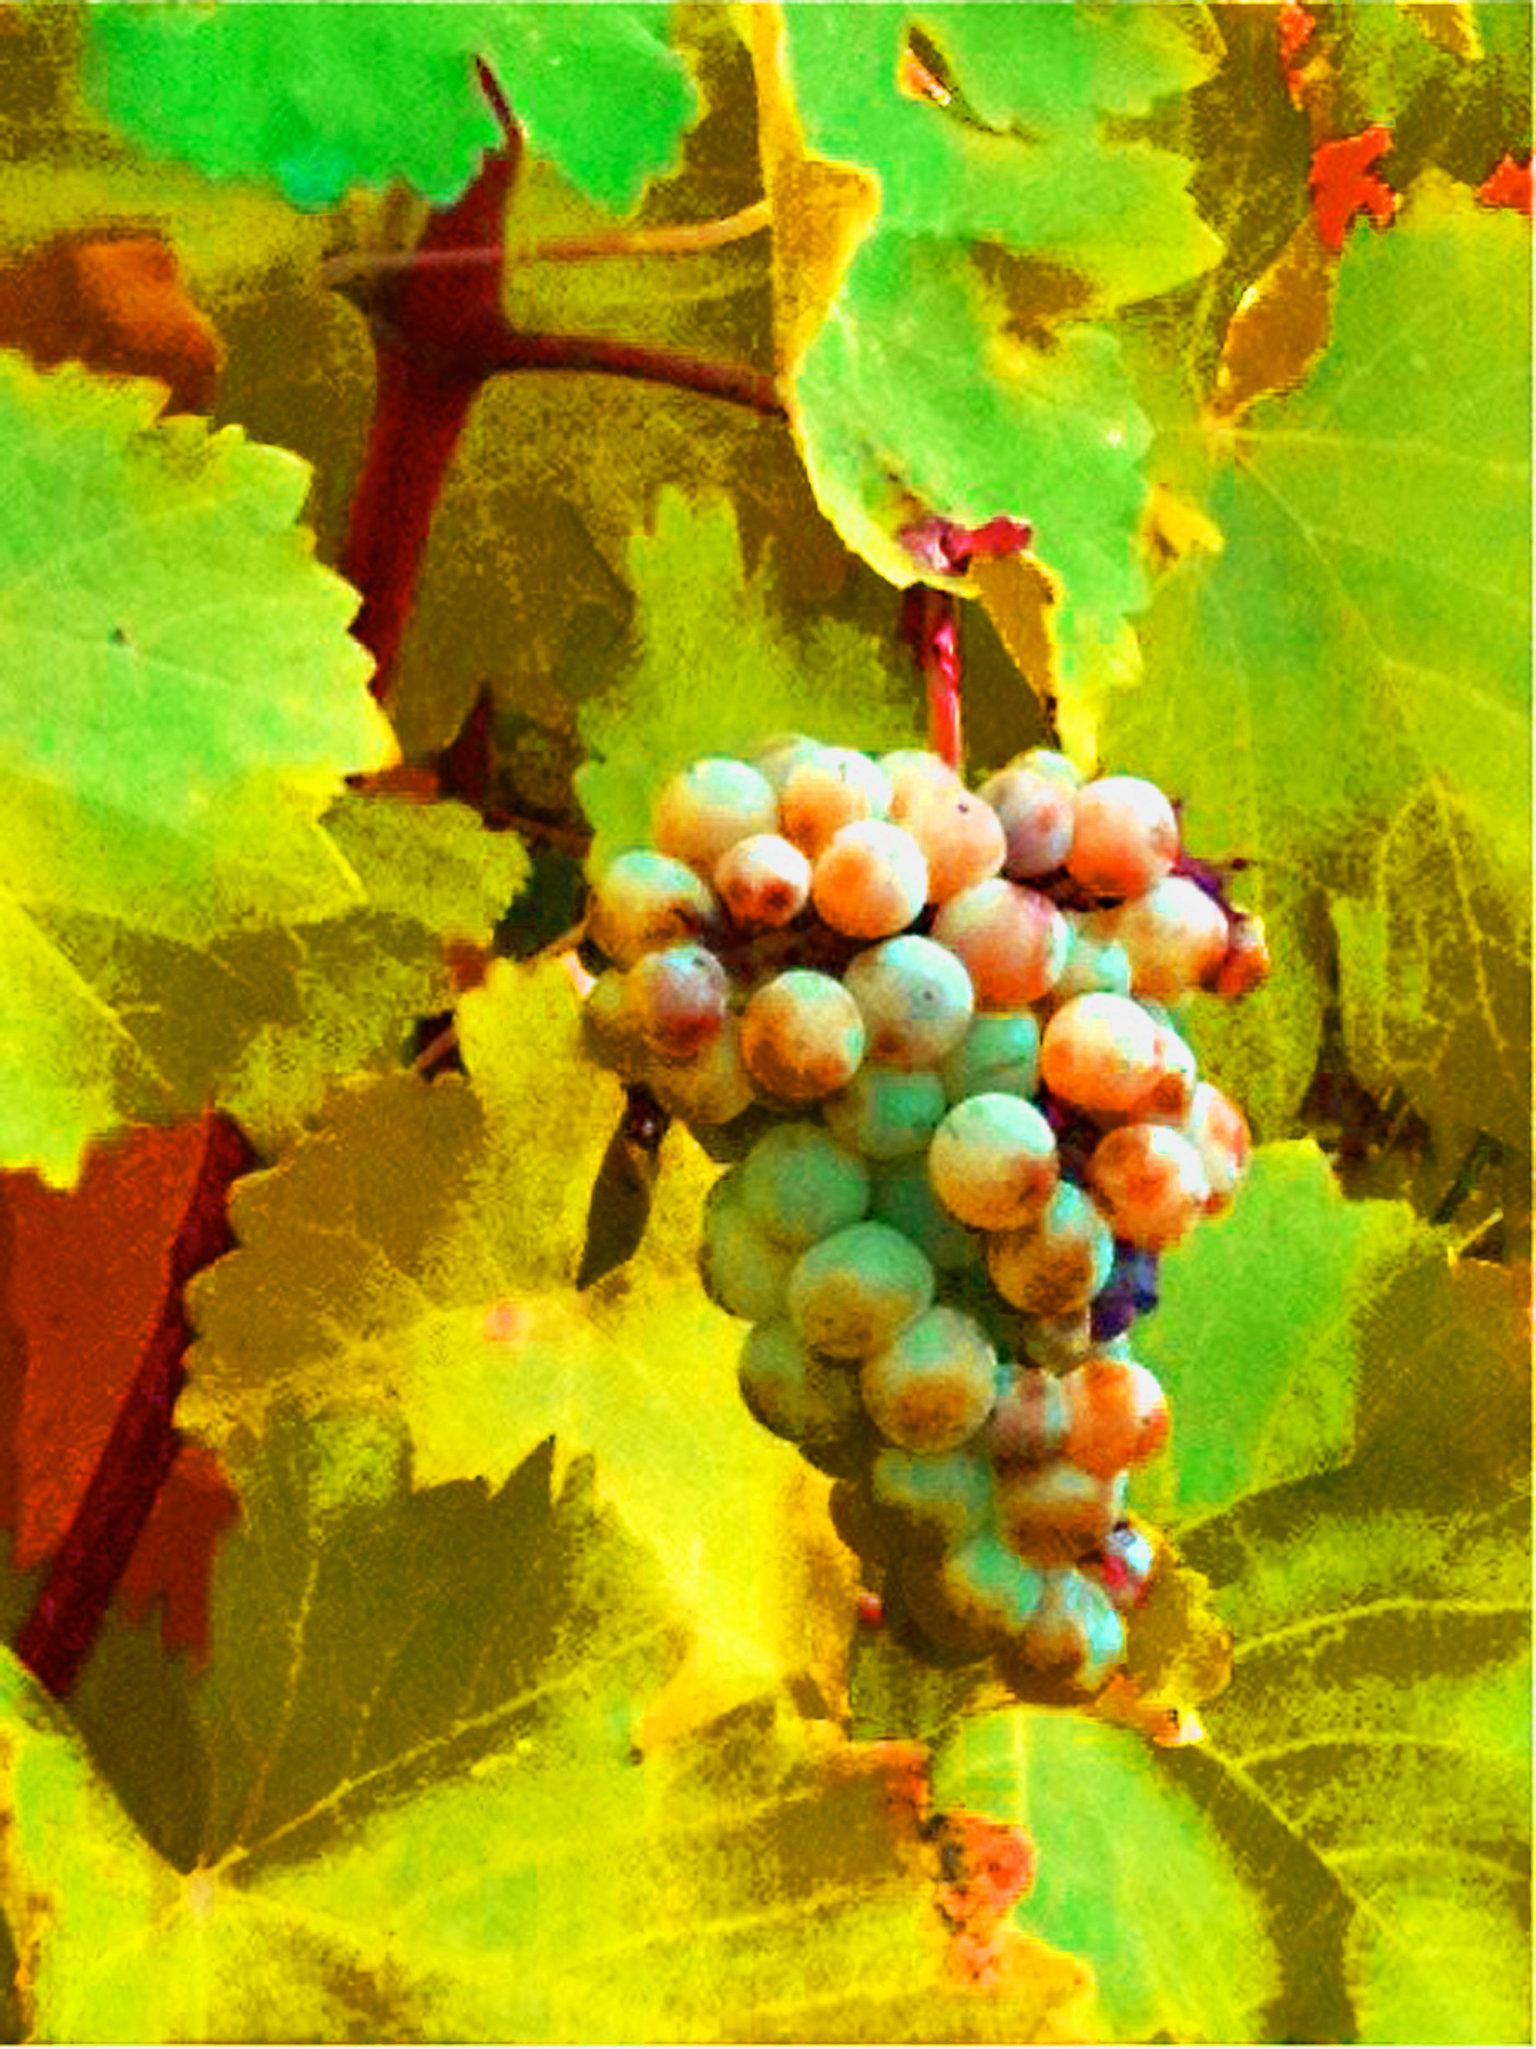 © CORDAY - Paschke Grapes